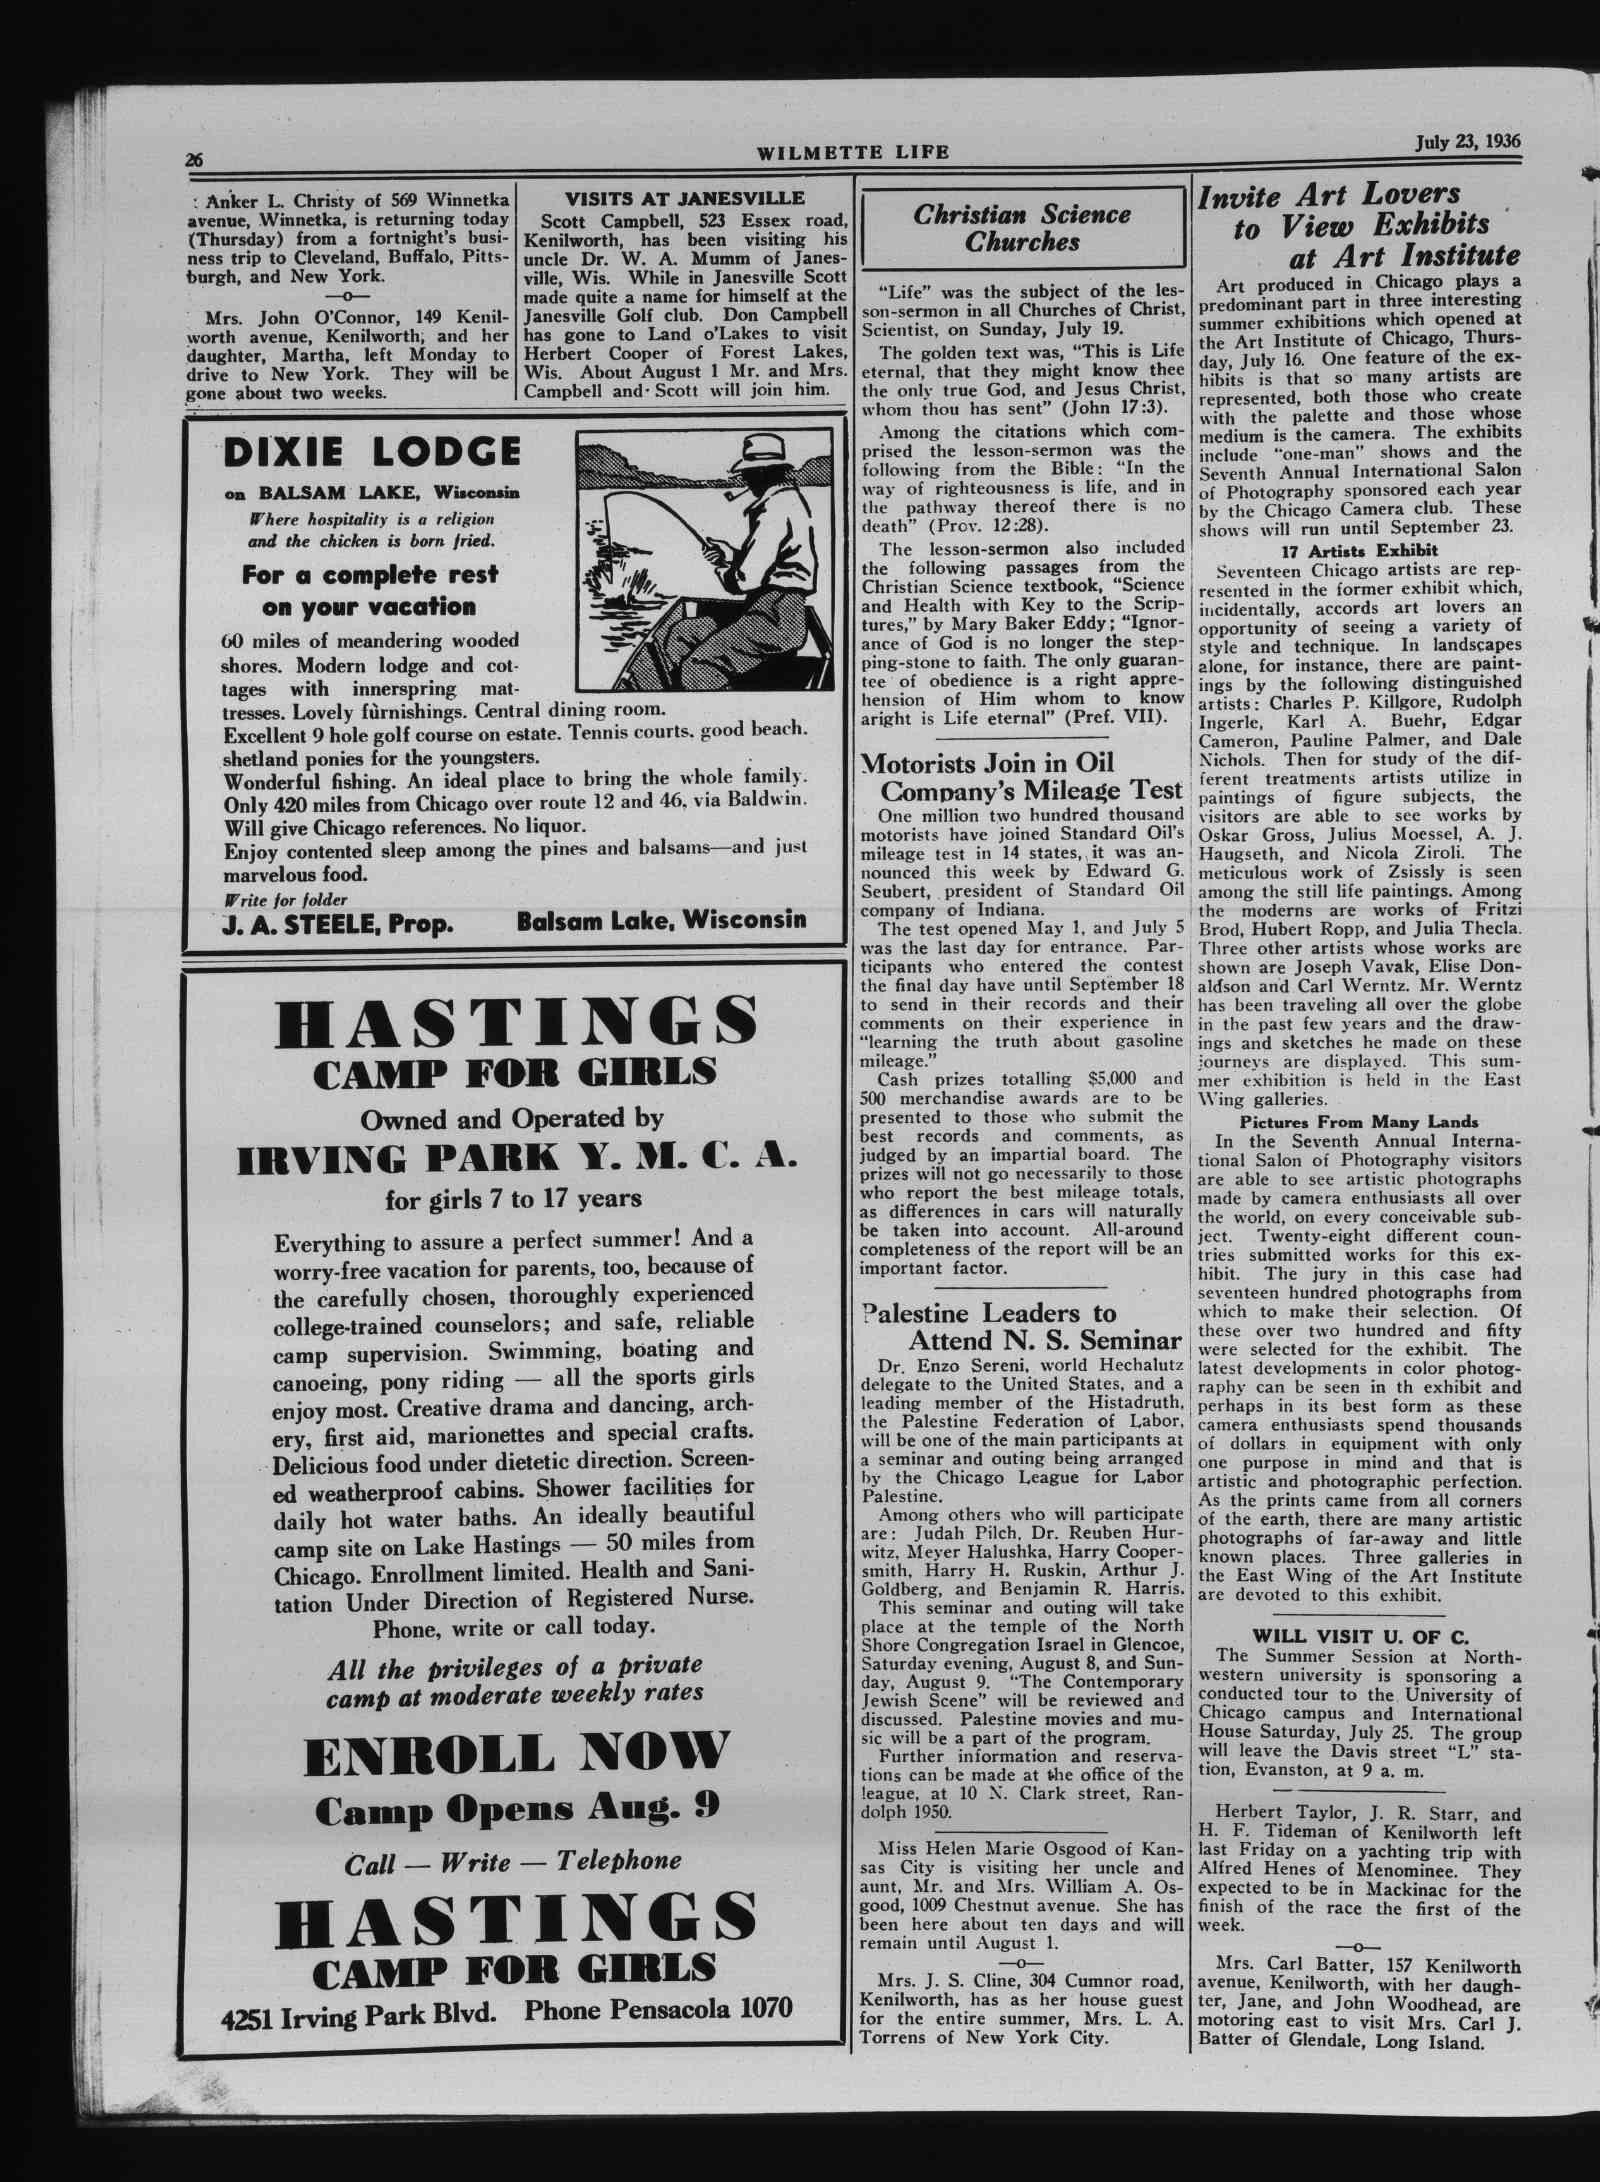 Wilmette Life (Wilmette, Illinois), 23 Jul 1936